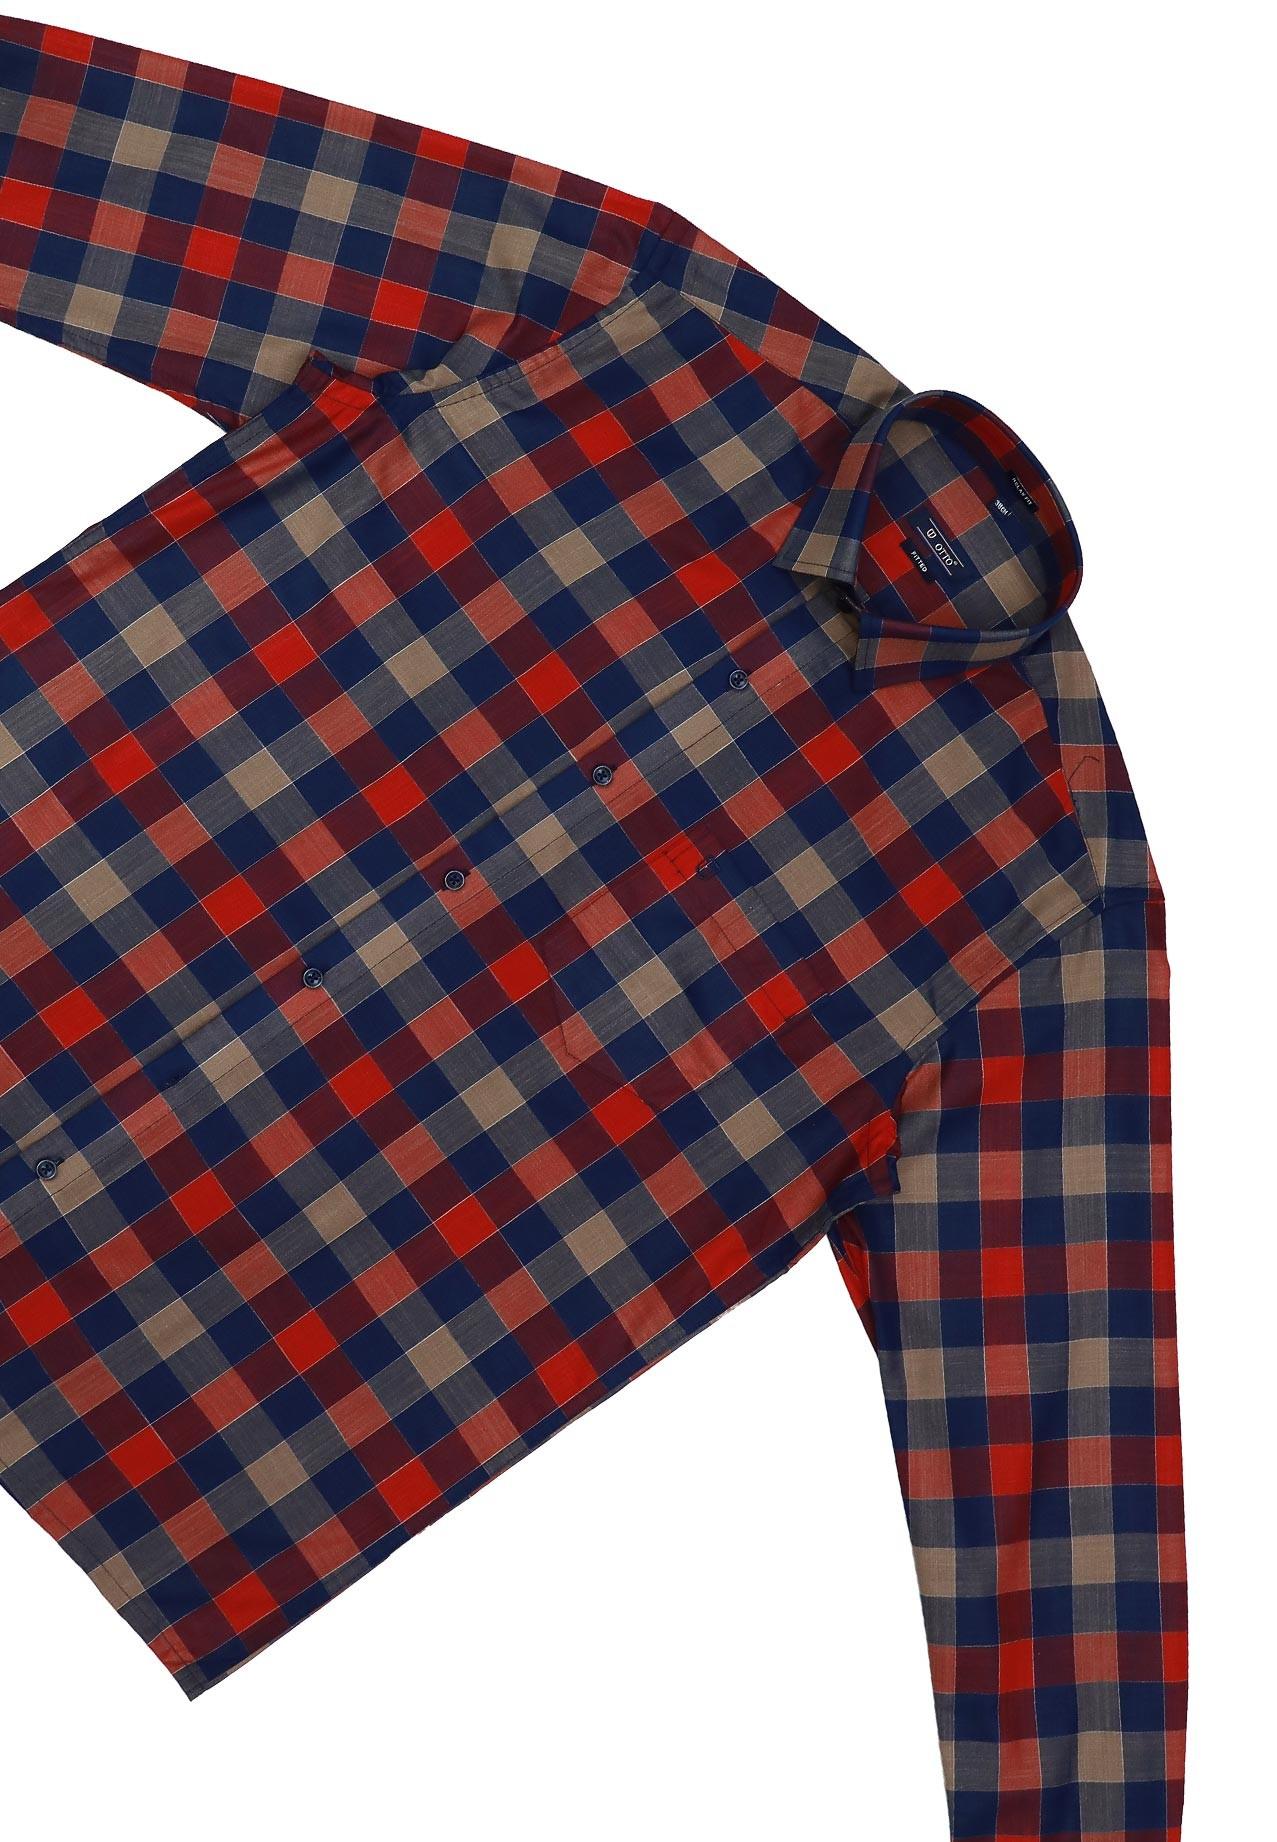 Otto LS CD80185 Mens Formal Shirt, Size 40